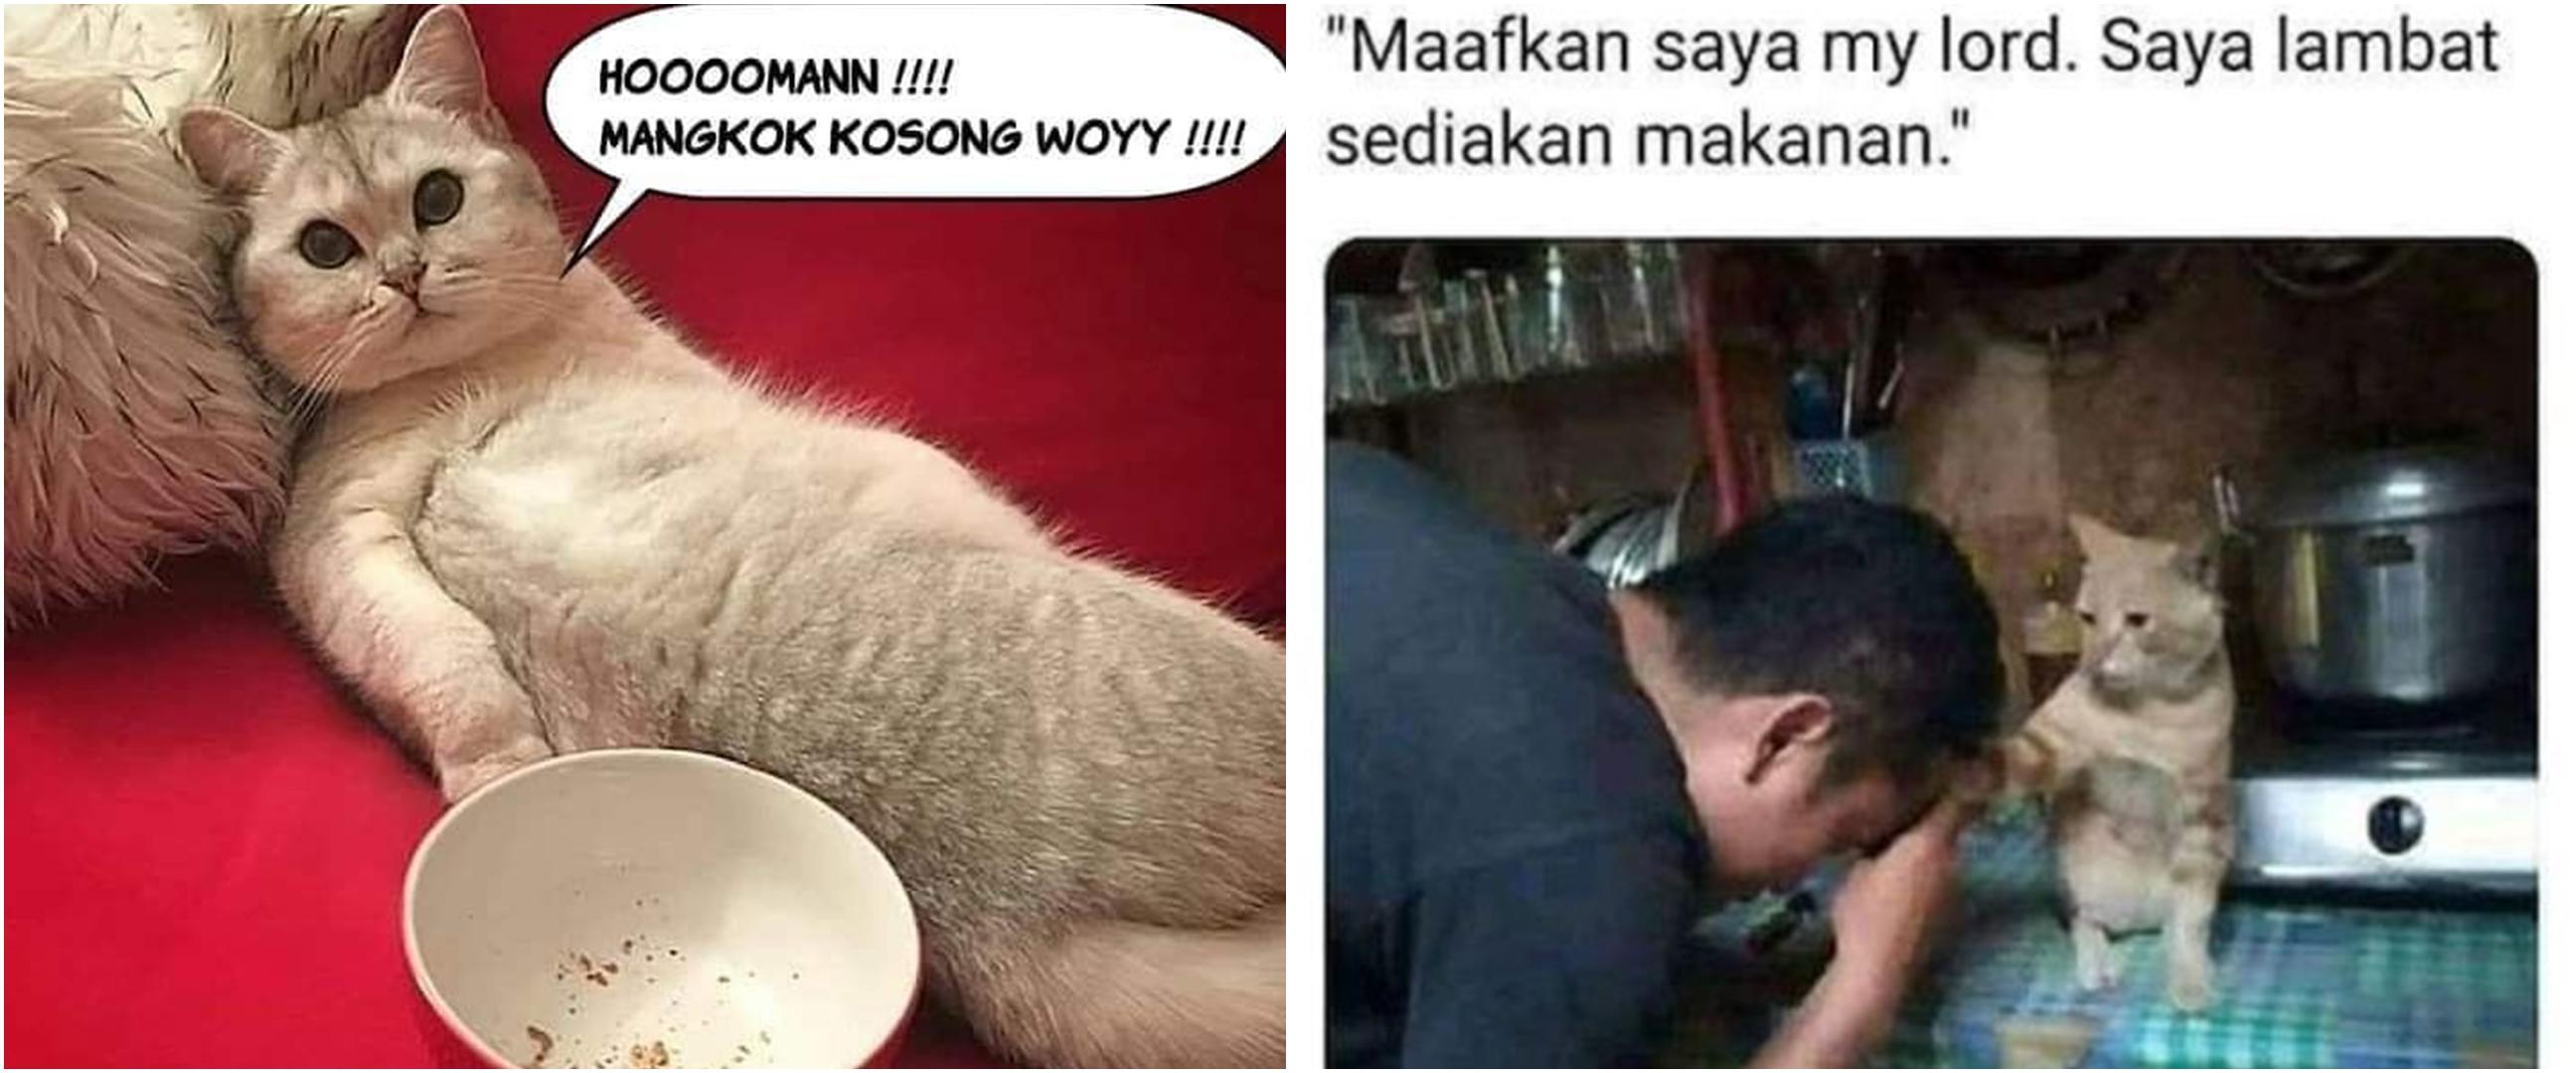 10 Meme lucu kalau hewan peliharaan dan majikan tukar peran